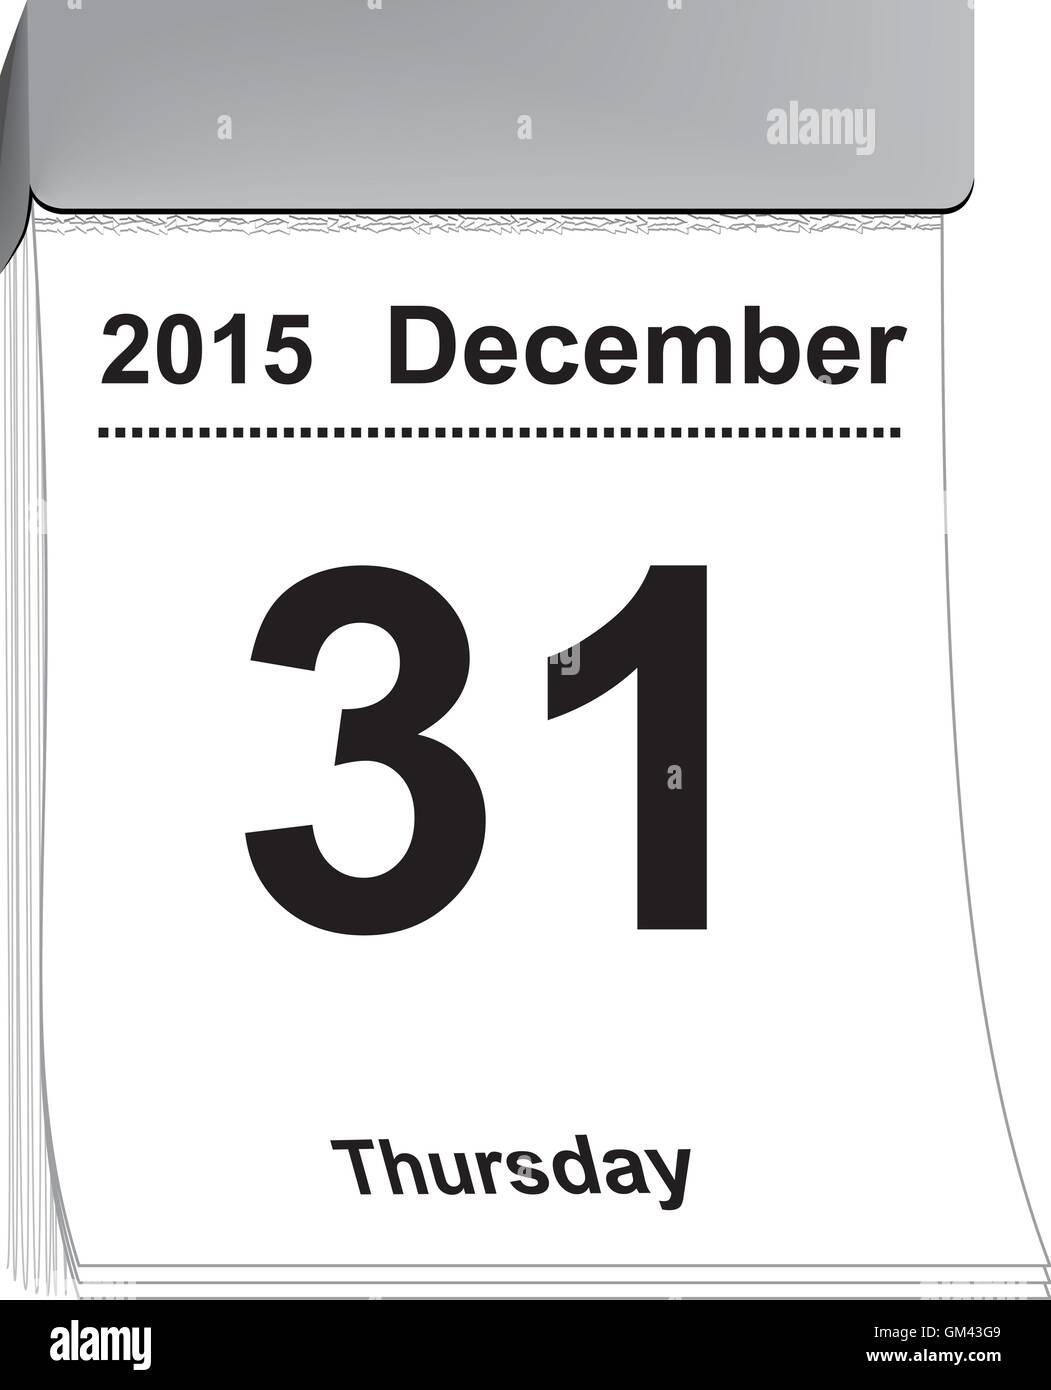 tear off calendar December 31, 2015 - Stock Image